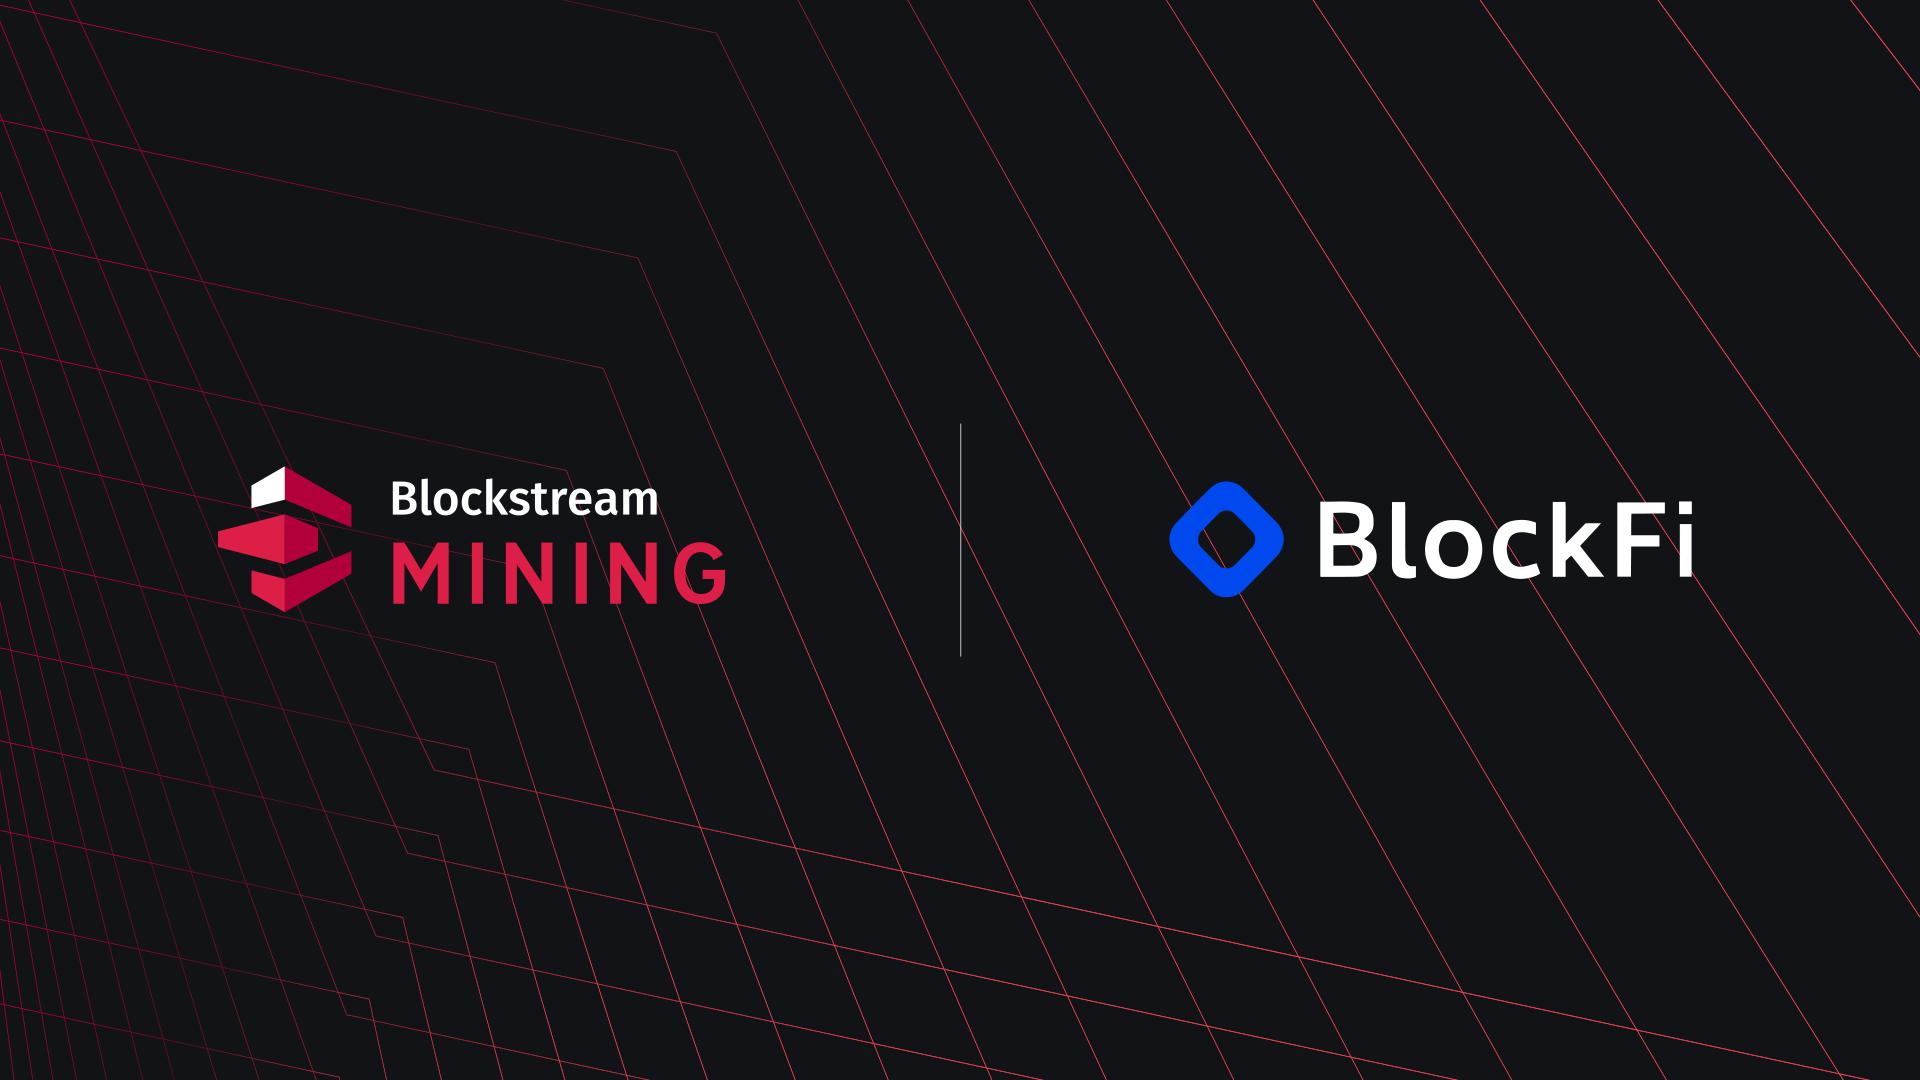 BlockFi Now Mining Bitcoin with Blockstream